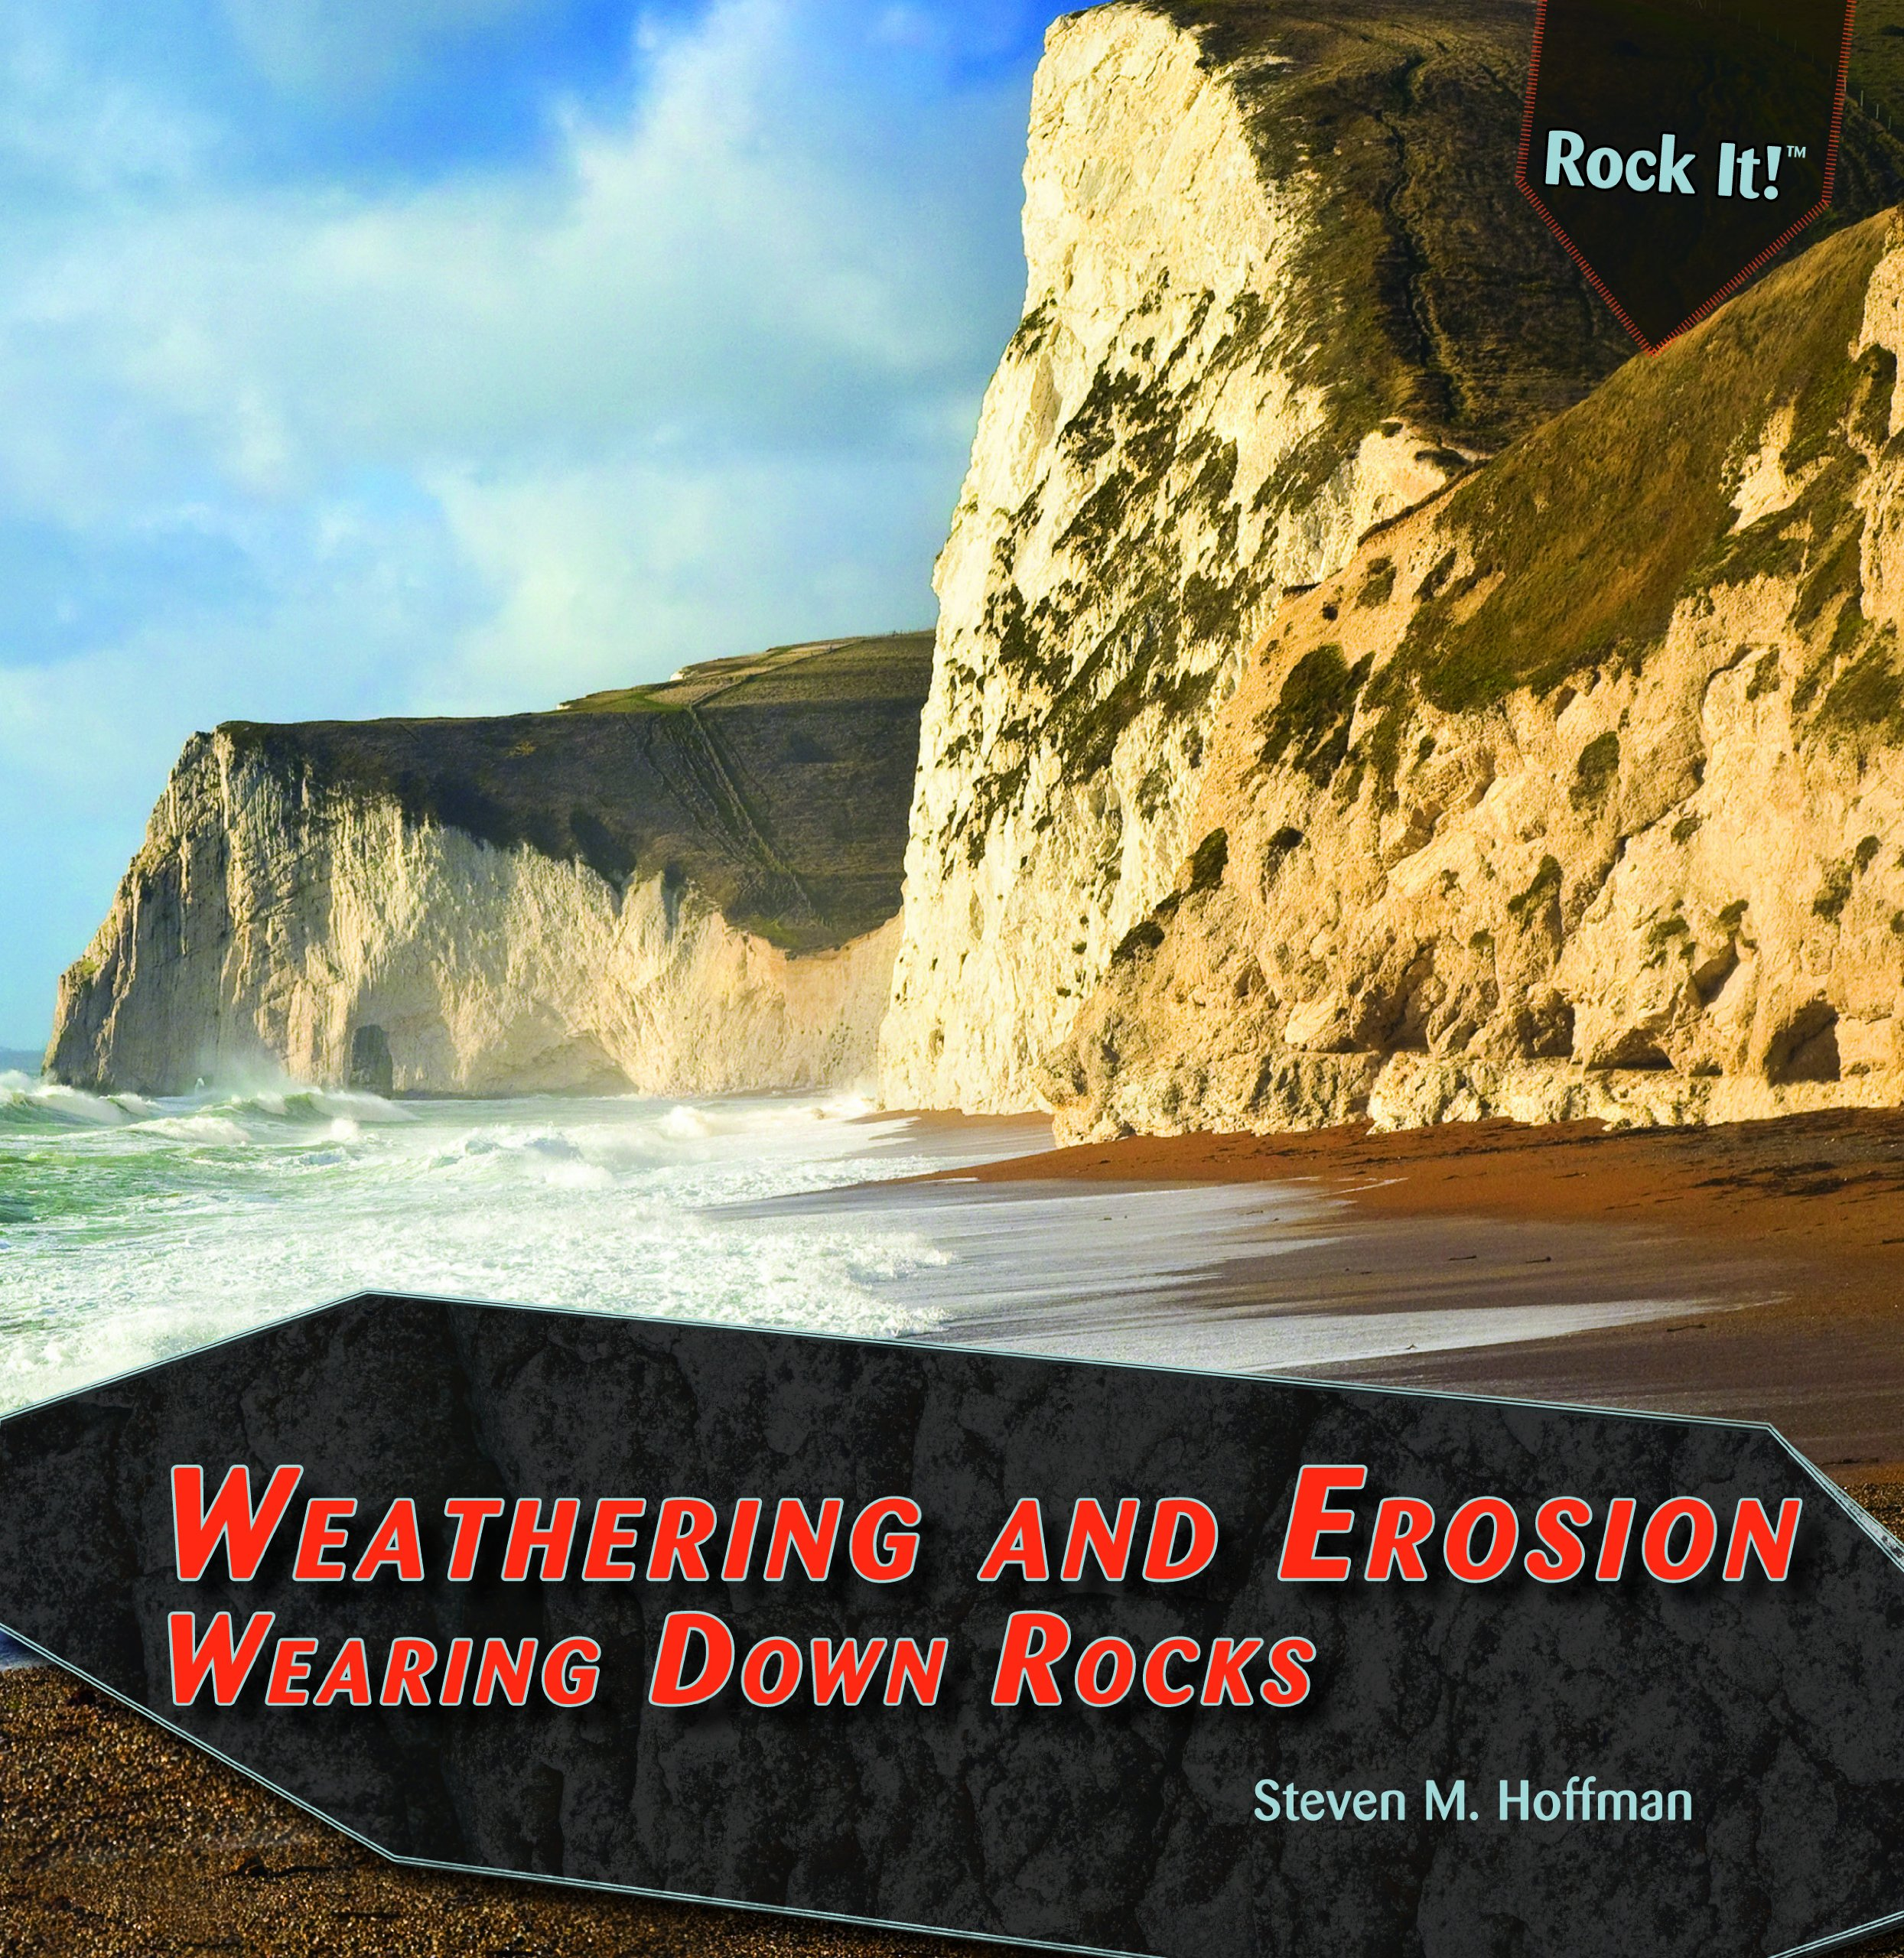 Download Weathering and Erosion: Wearing Down Rocks (Rock It!) ebook